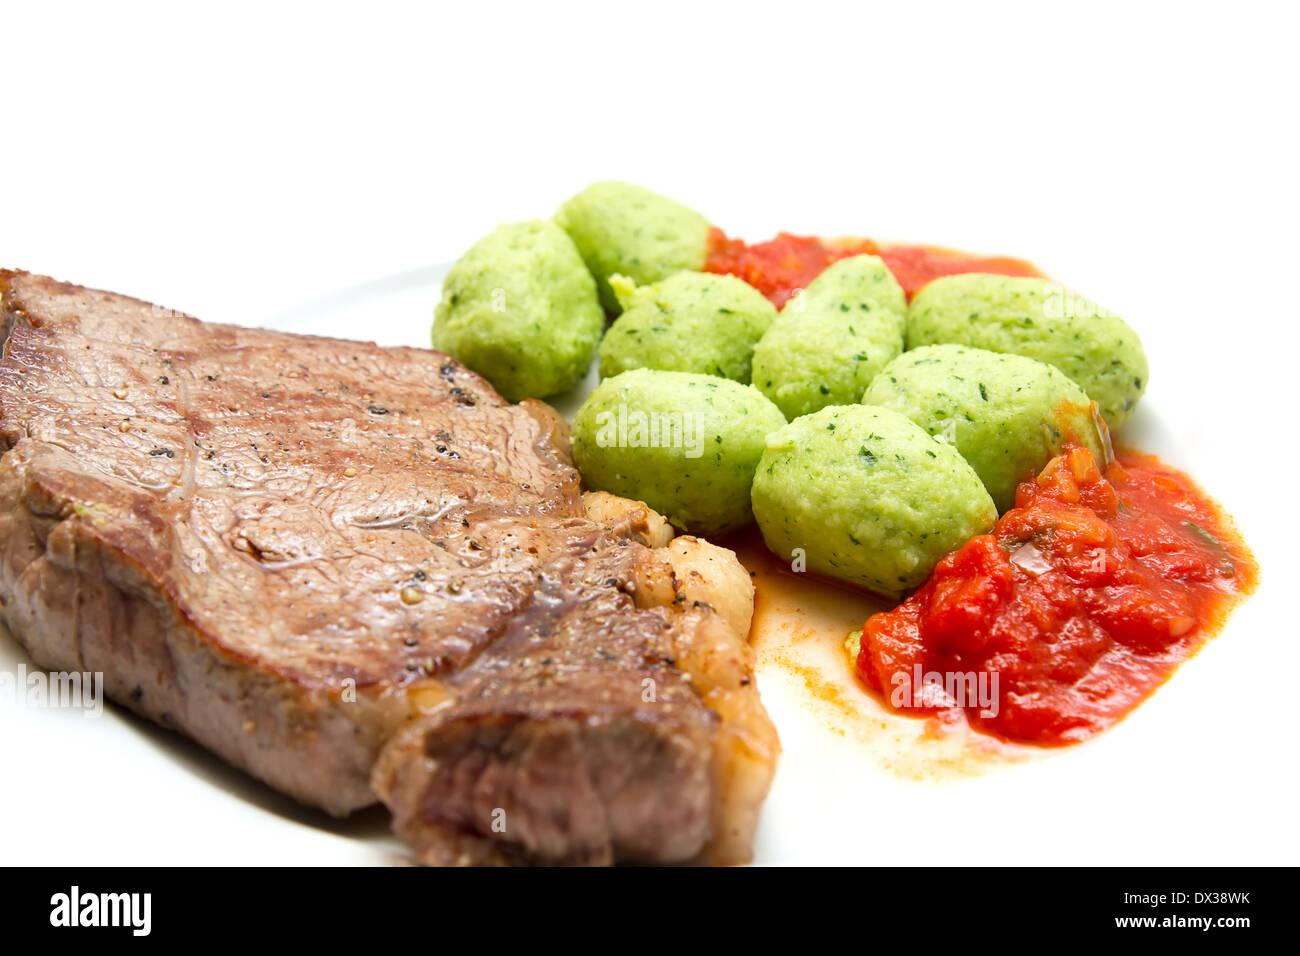 Steak Rezepte Stock Photos Steak Rezepte Stock Images Alamy